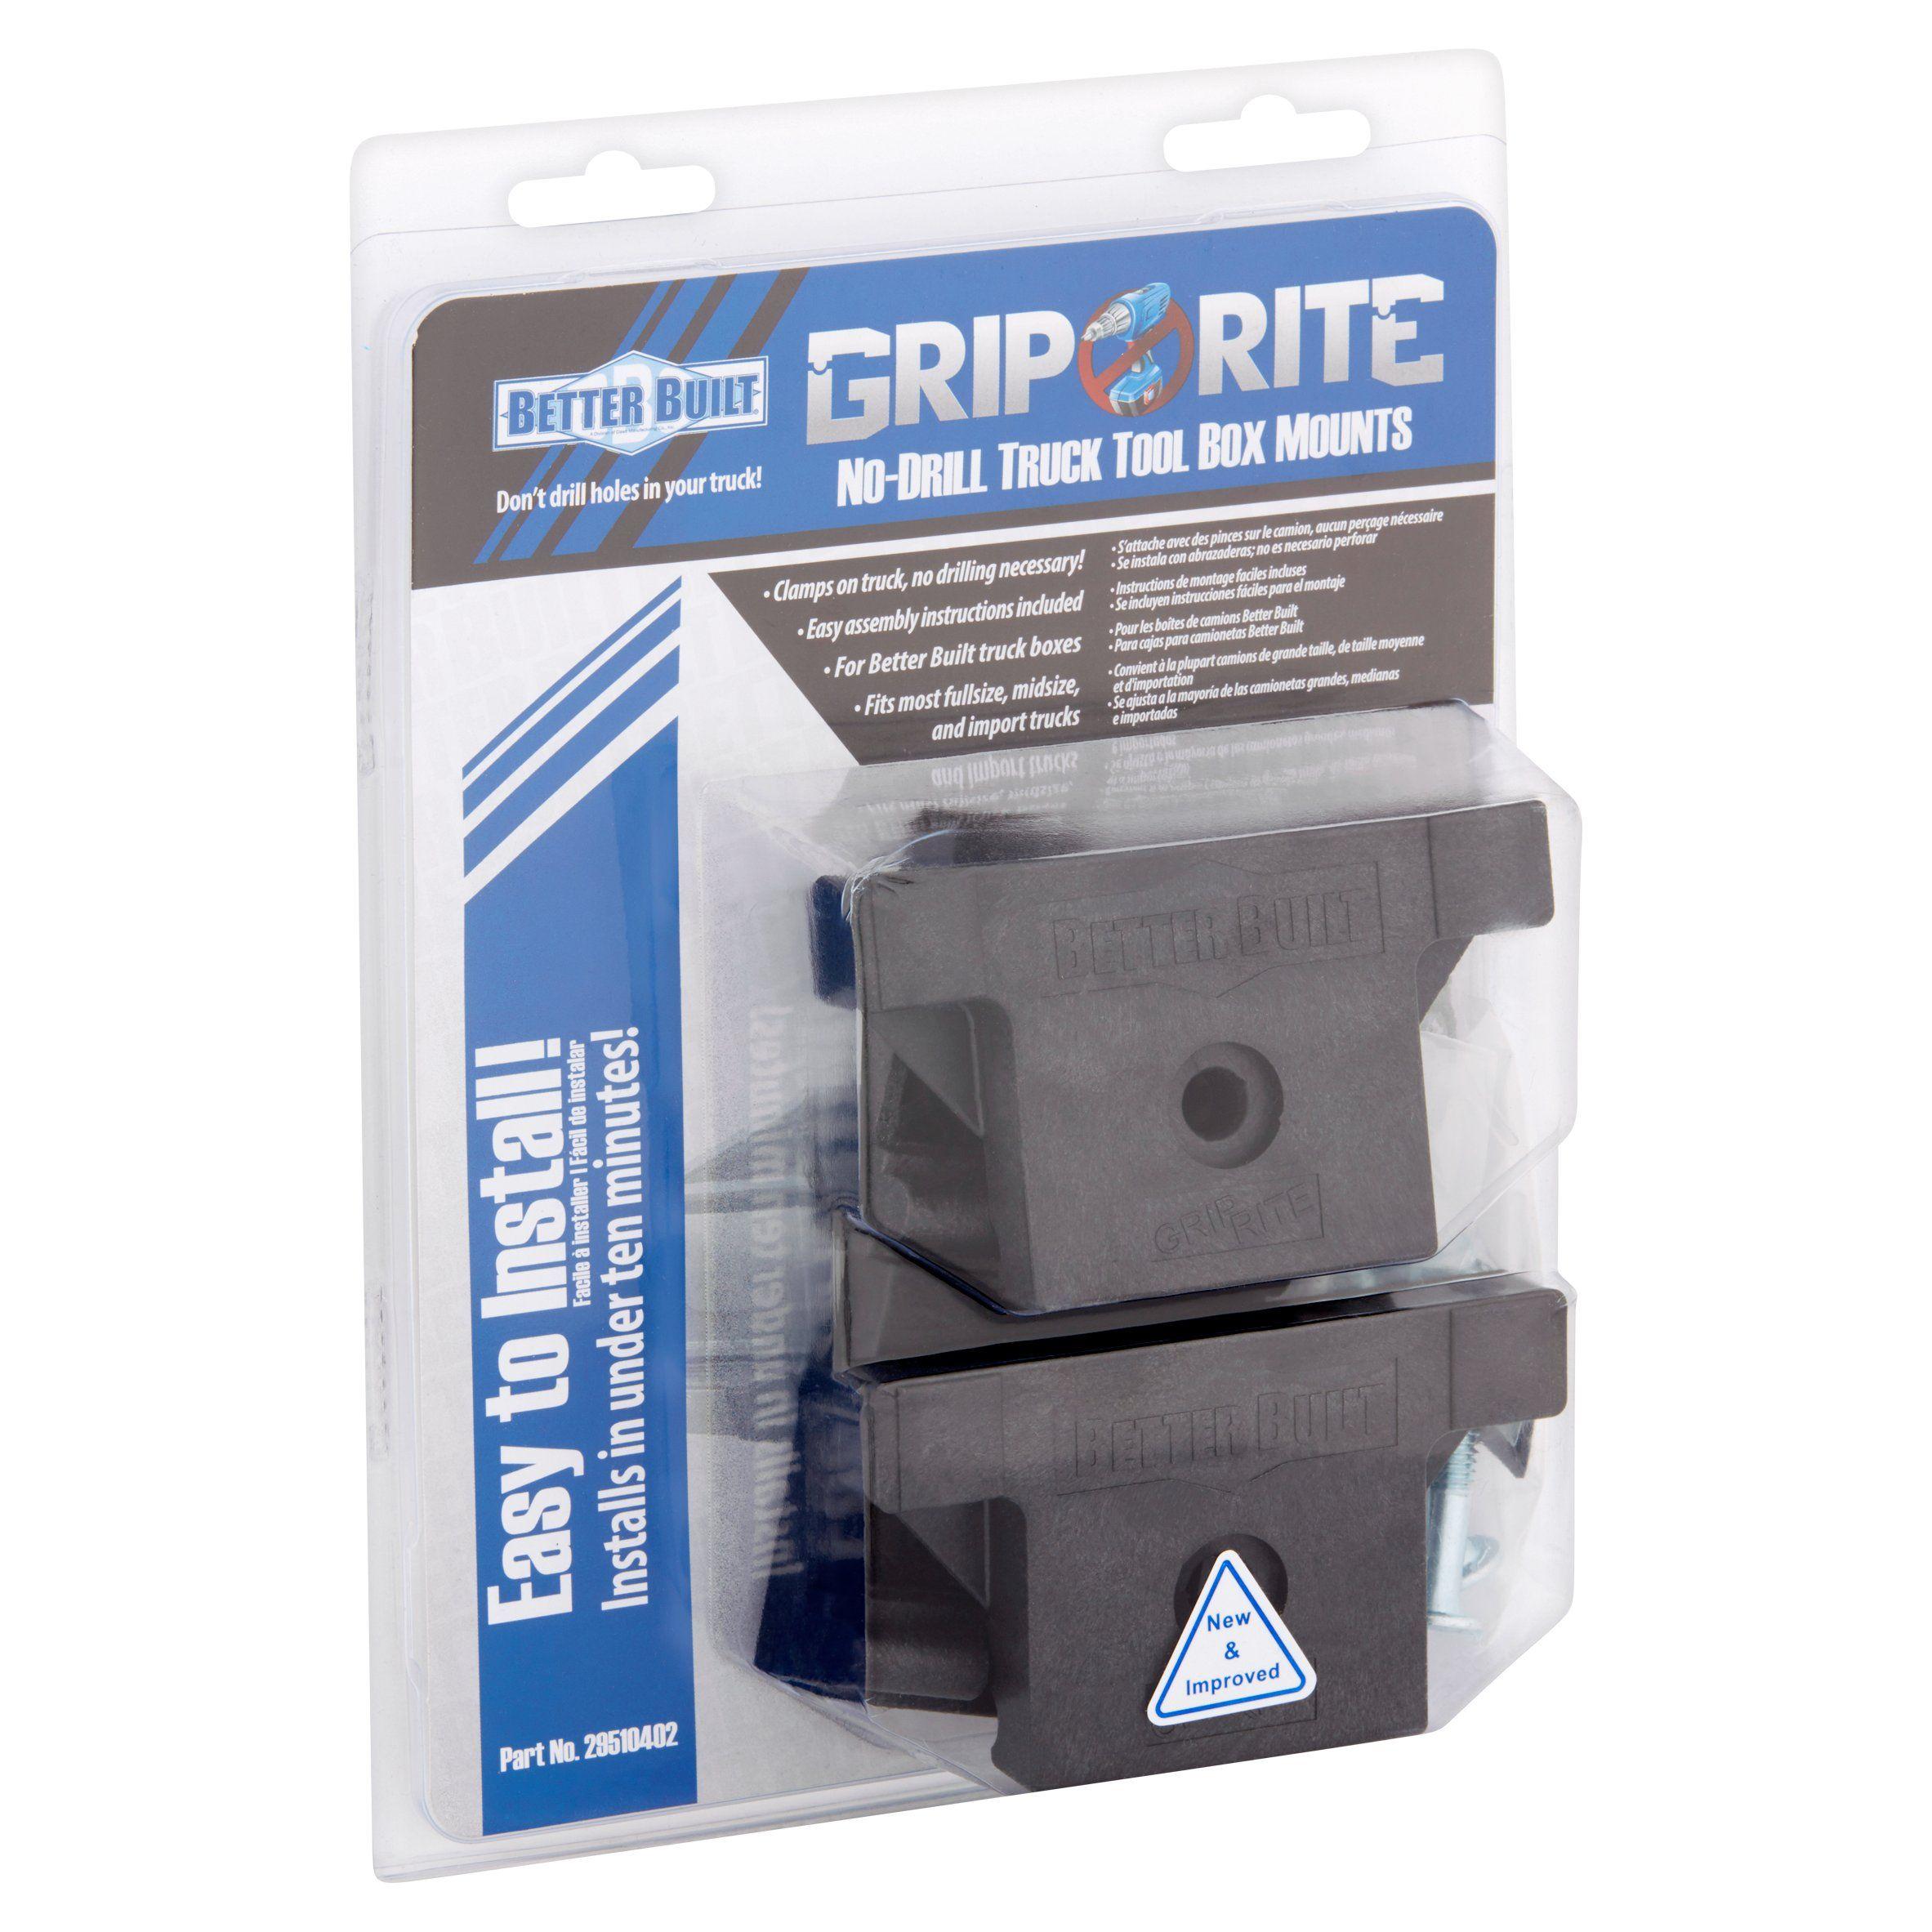 b70ce21c1 Better Built Grip Rite No-Drill Truck Tool Box Mounts - Walmart.com